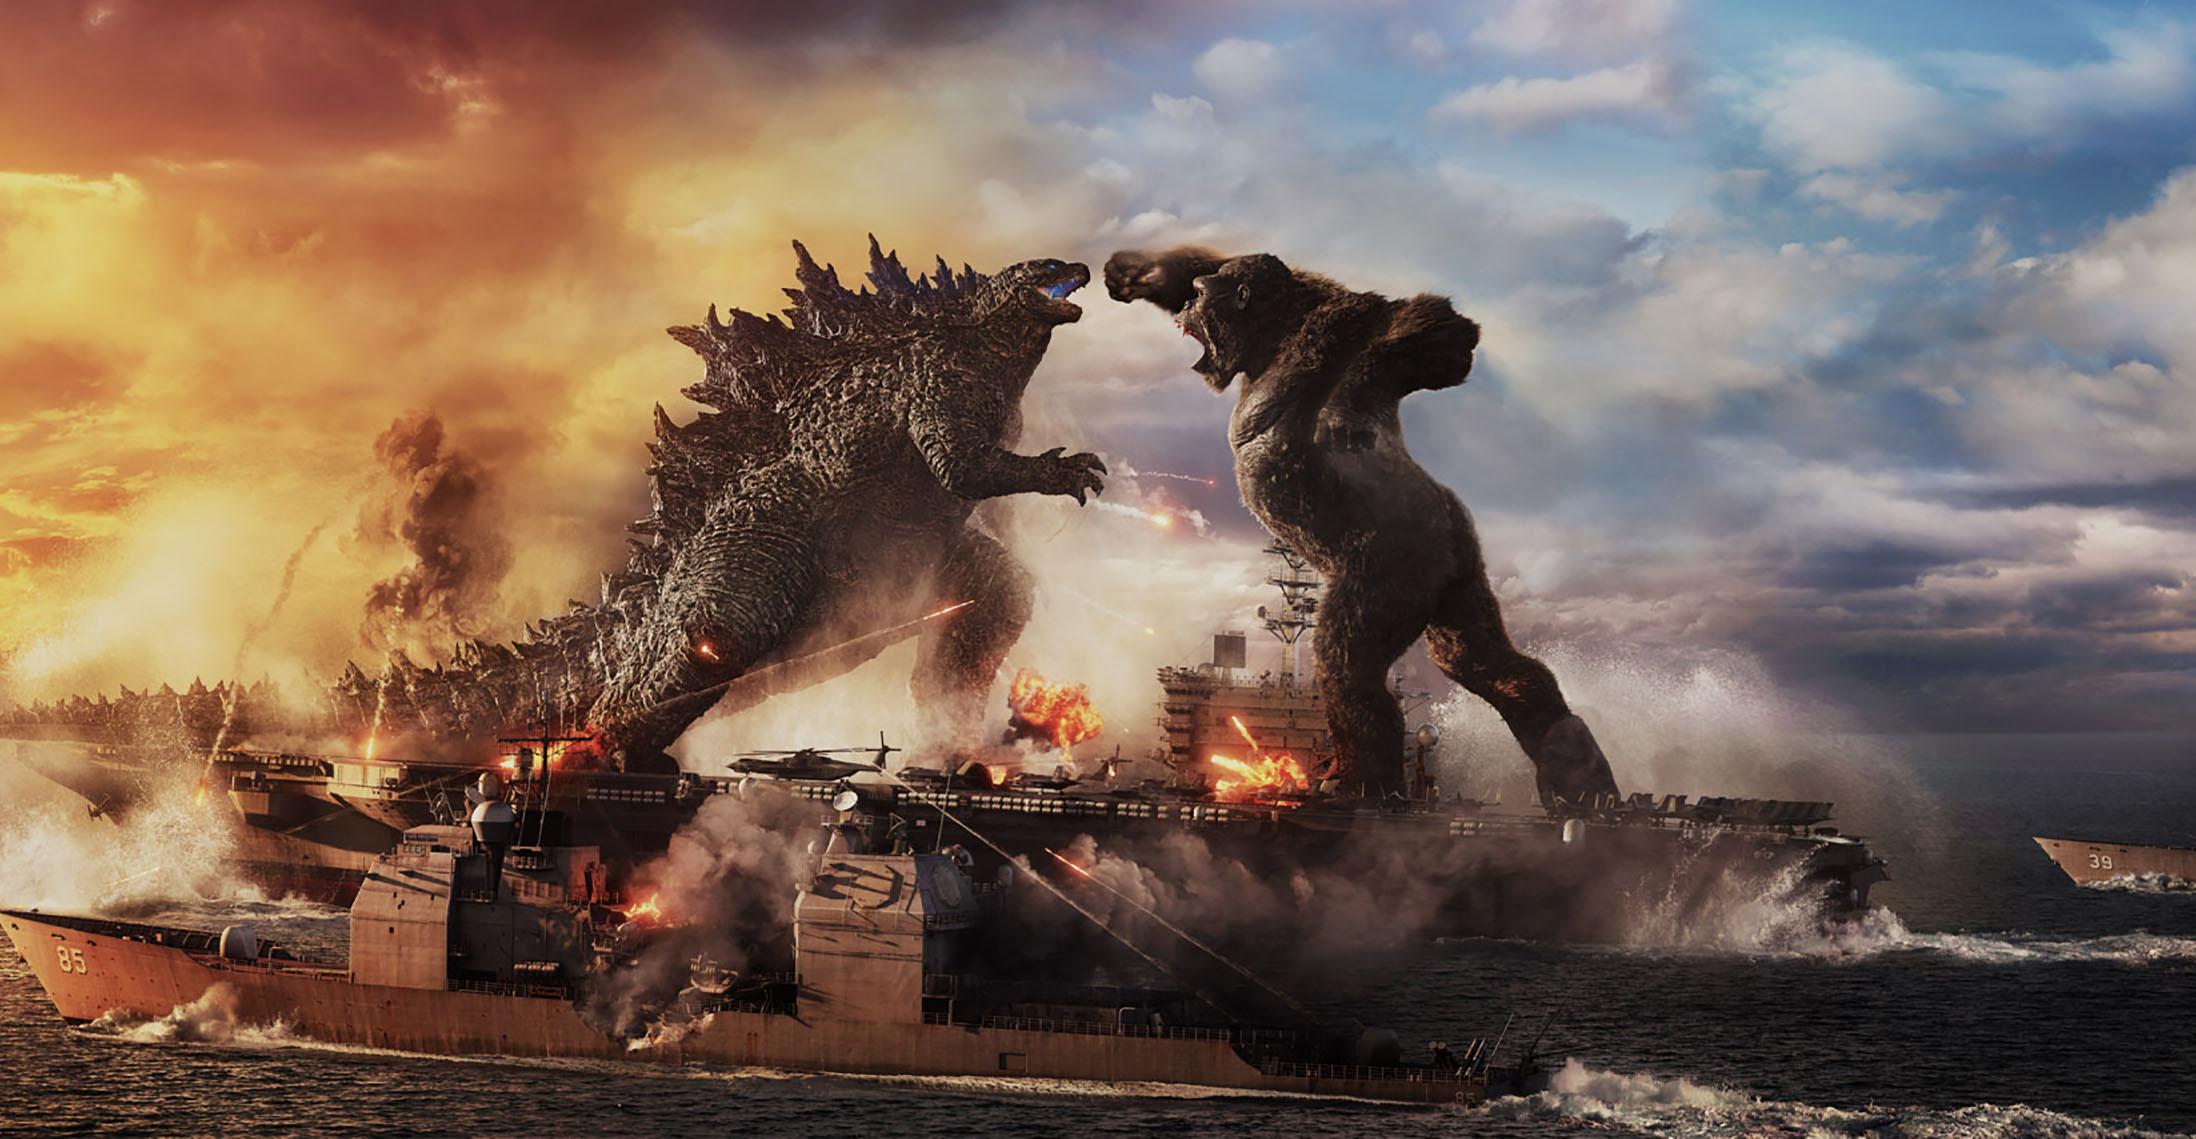 'We need Kong': Checa el impresionante primer tráiler de 'Godzilla vs. Kong'